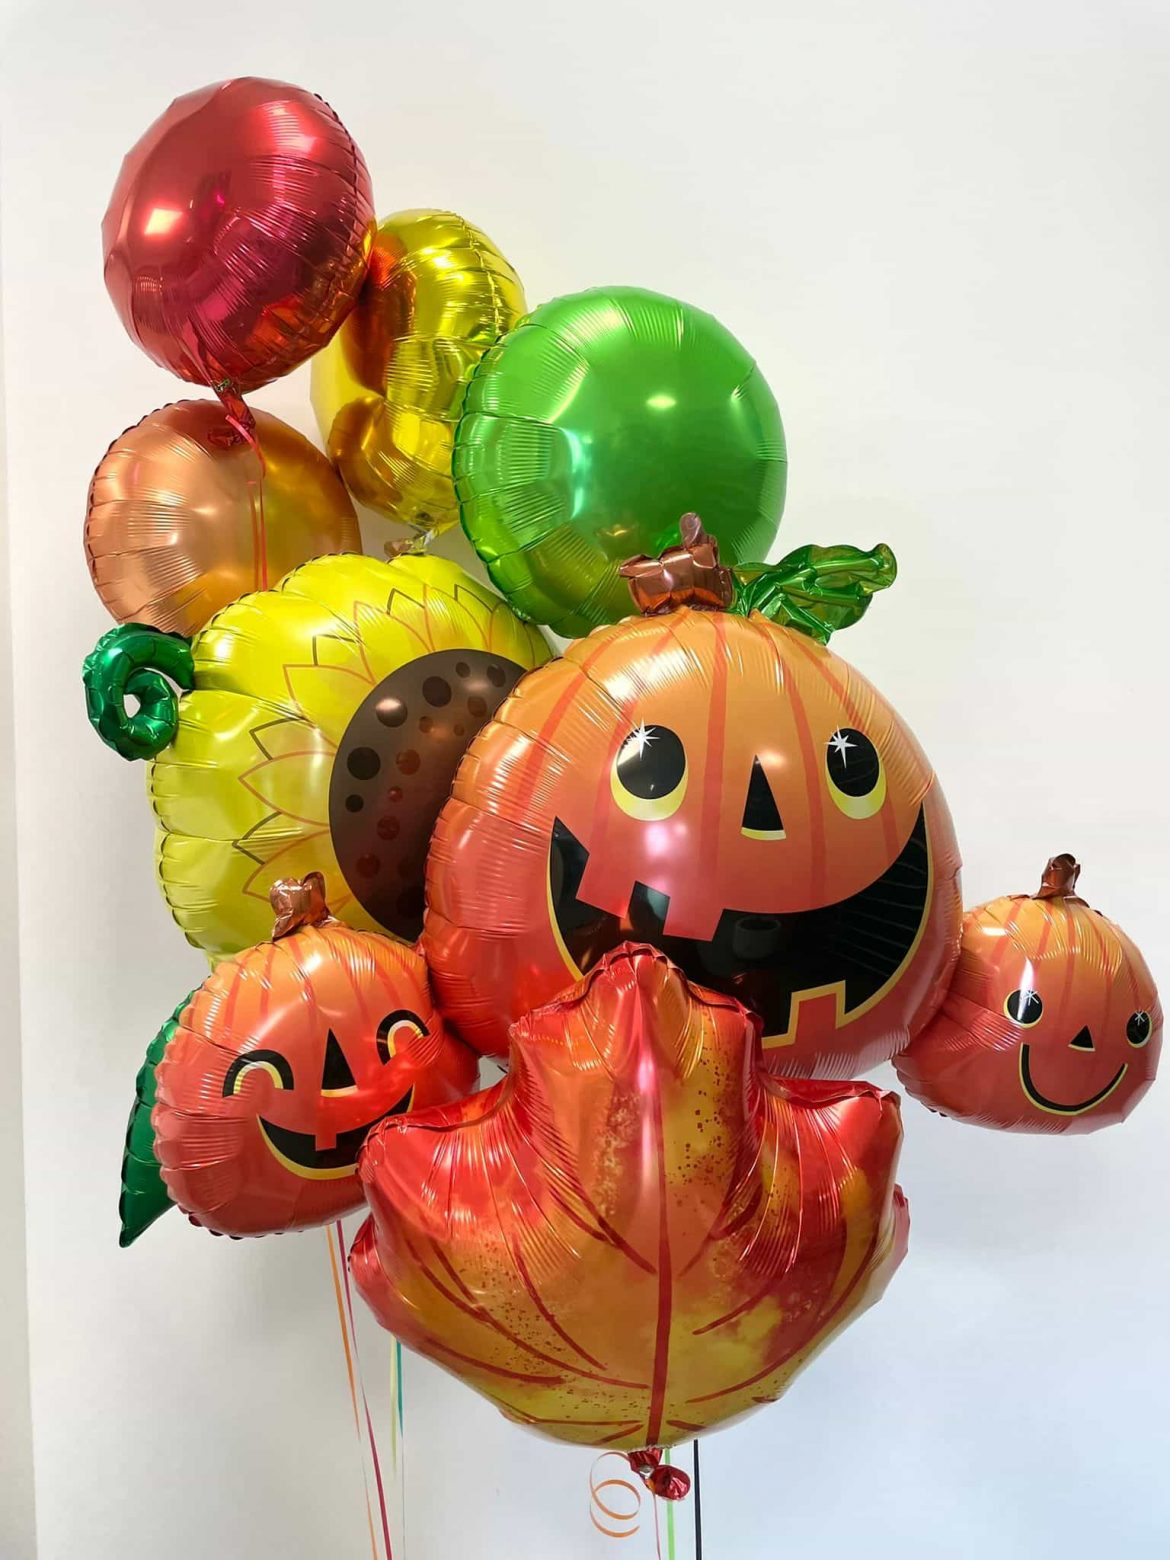 Ballontraube bunte Heliumballons mit Kürbis Halloween